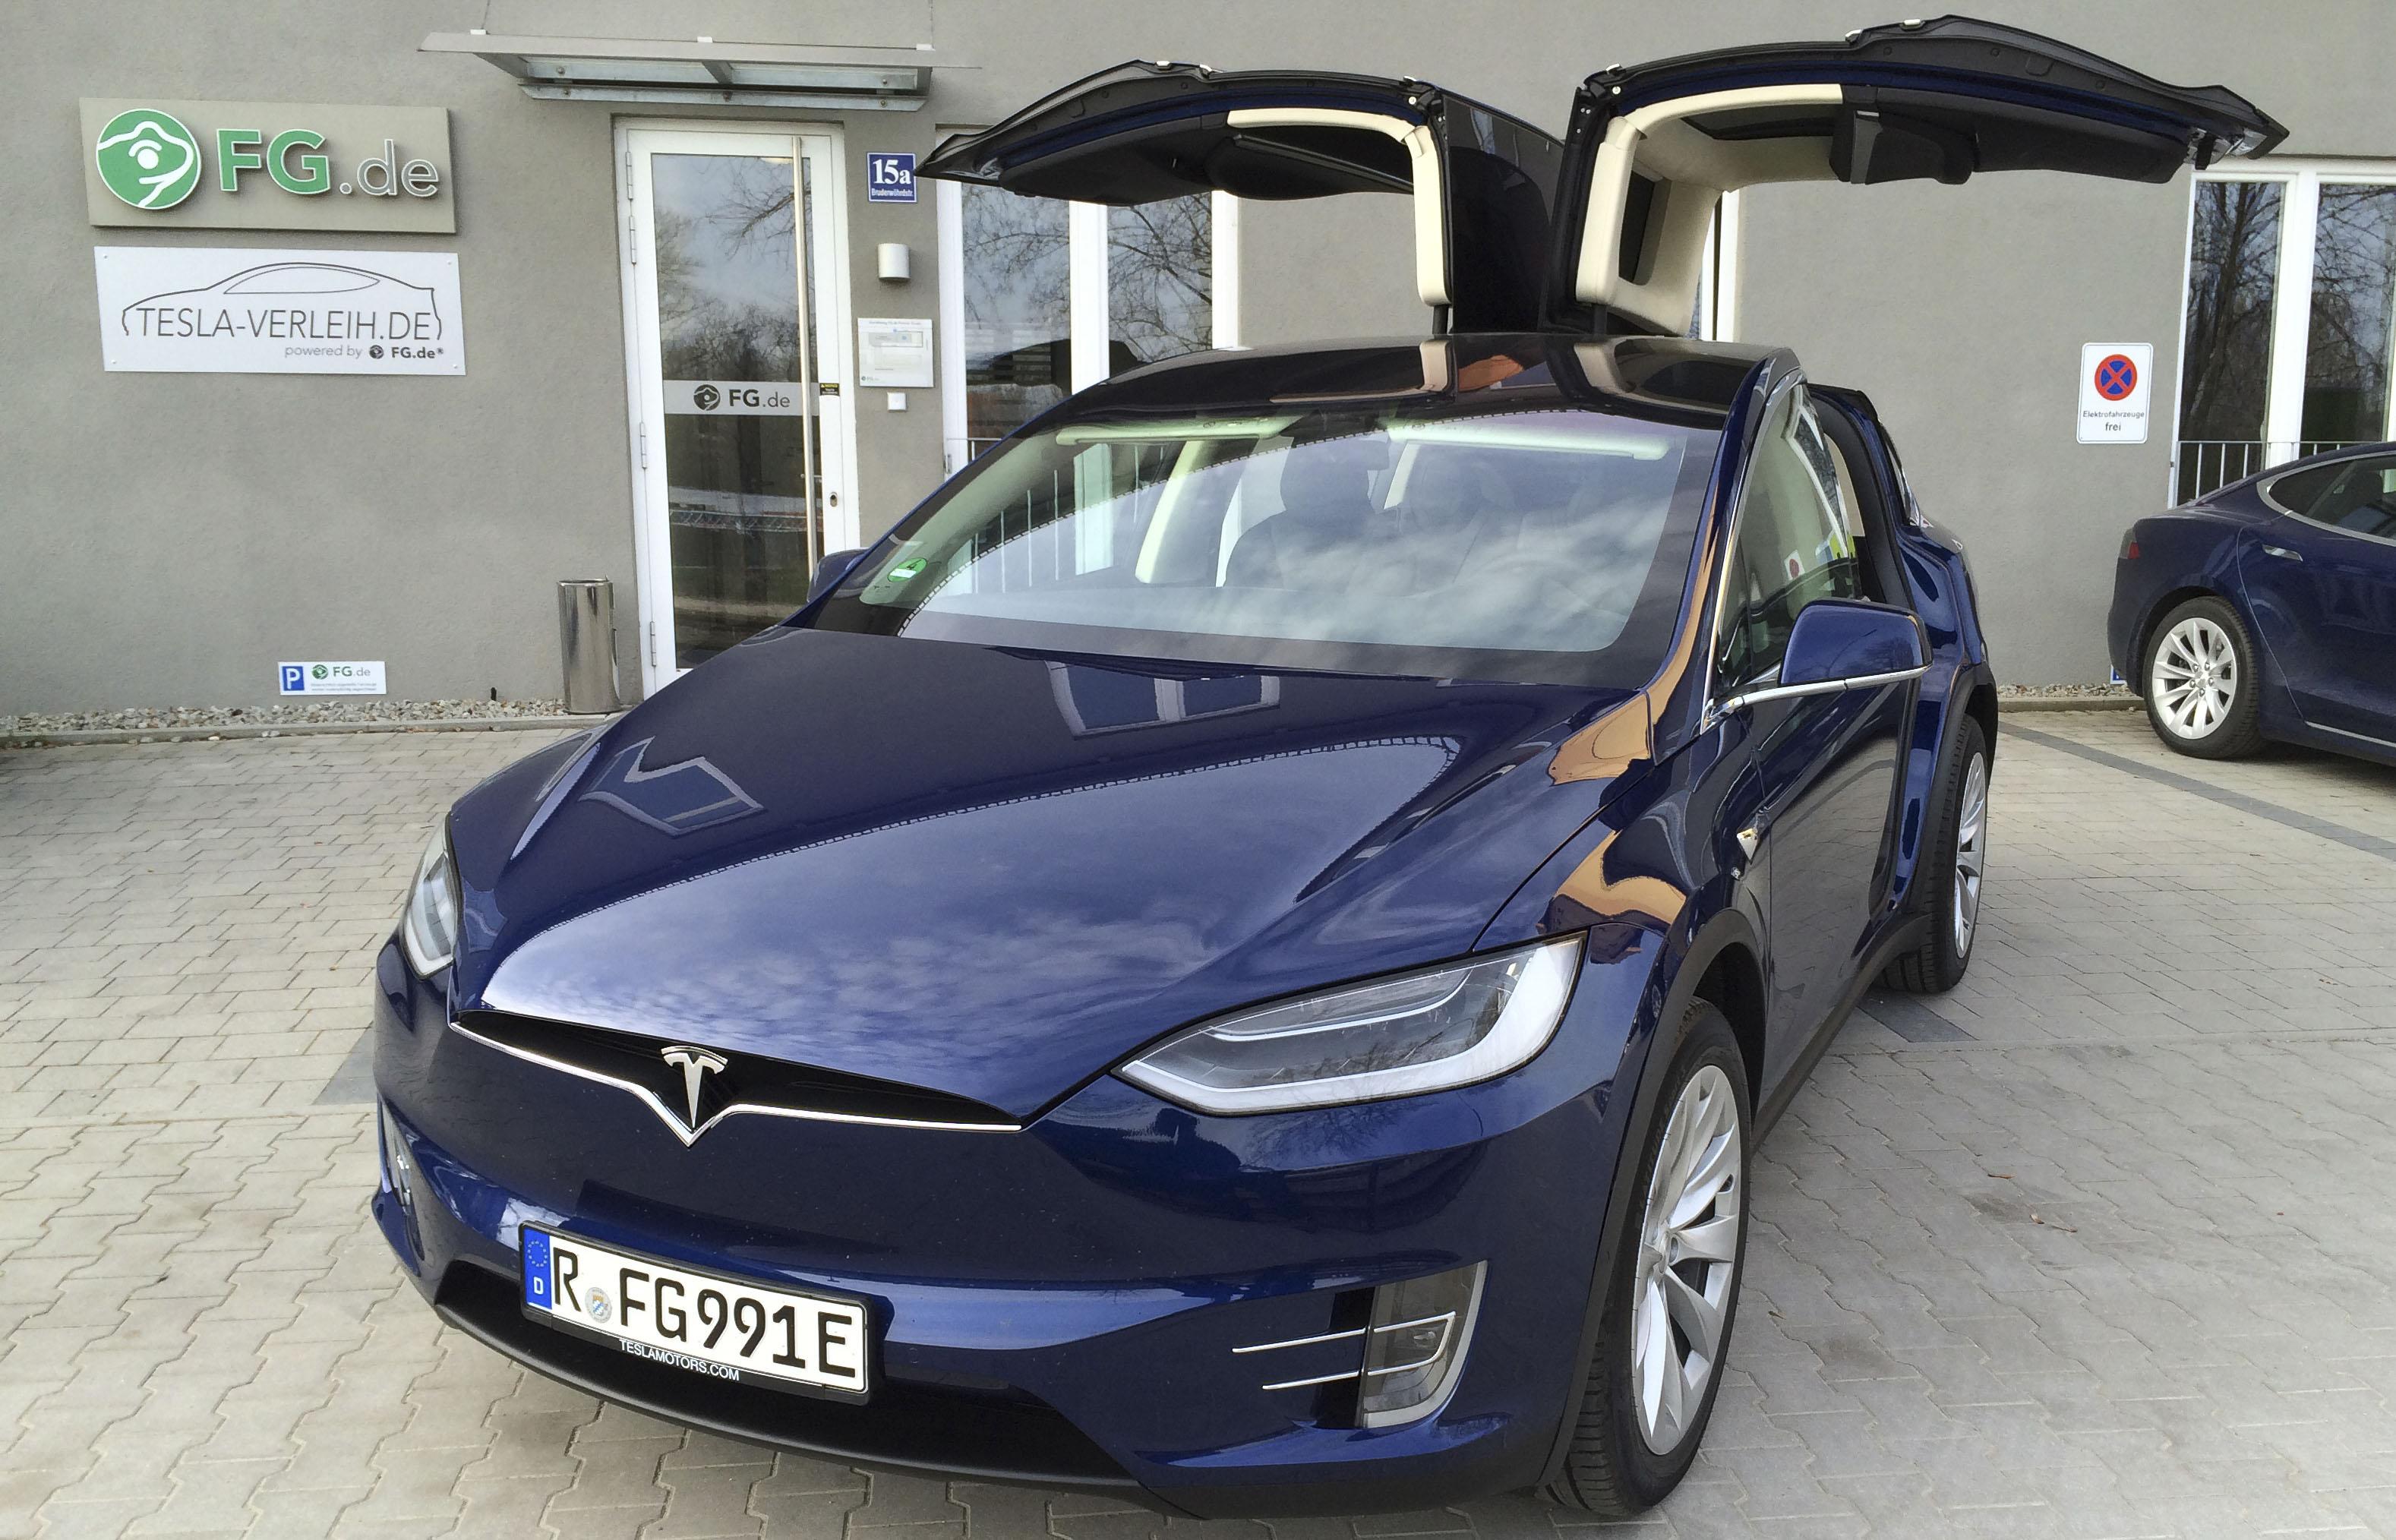 Tesla Verleih, Regensburg, Tesla Modelle X und S